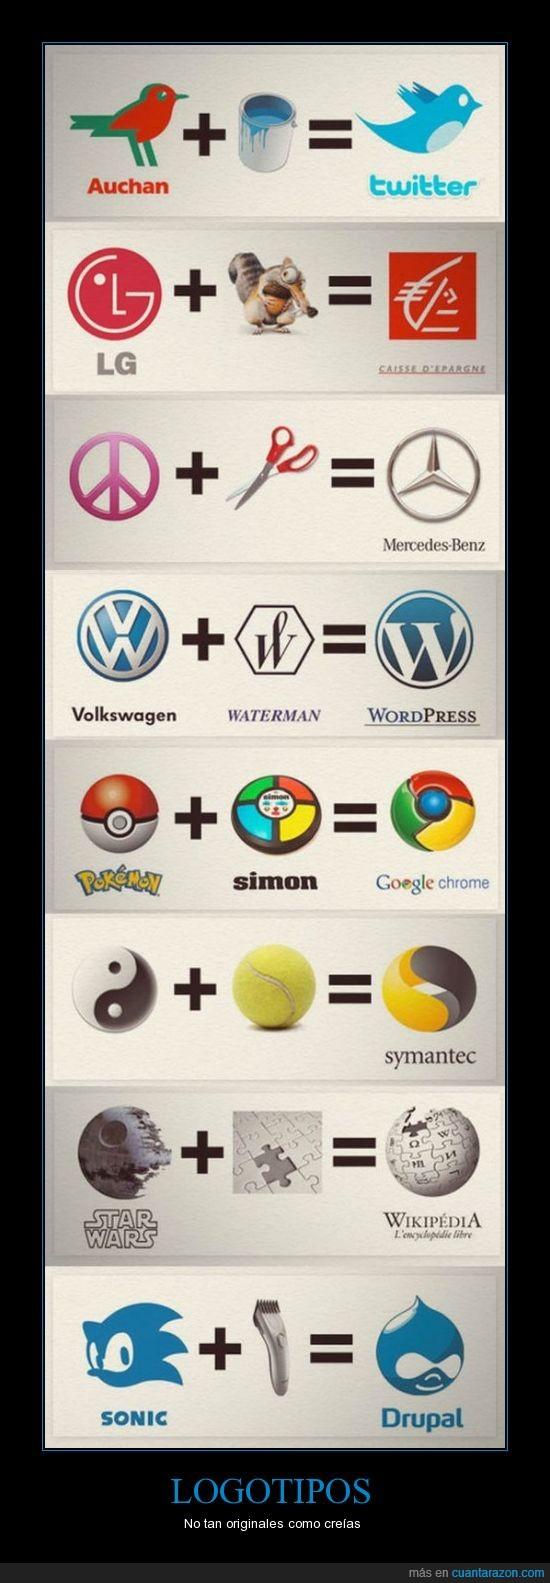 logotipos,marcas